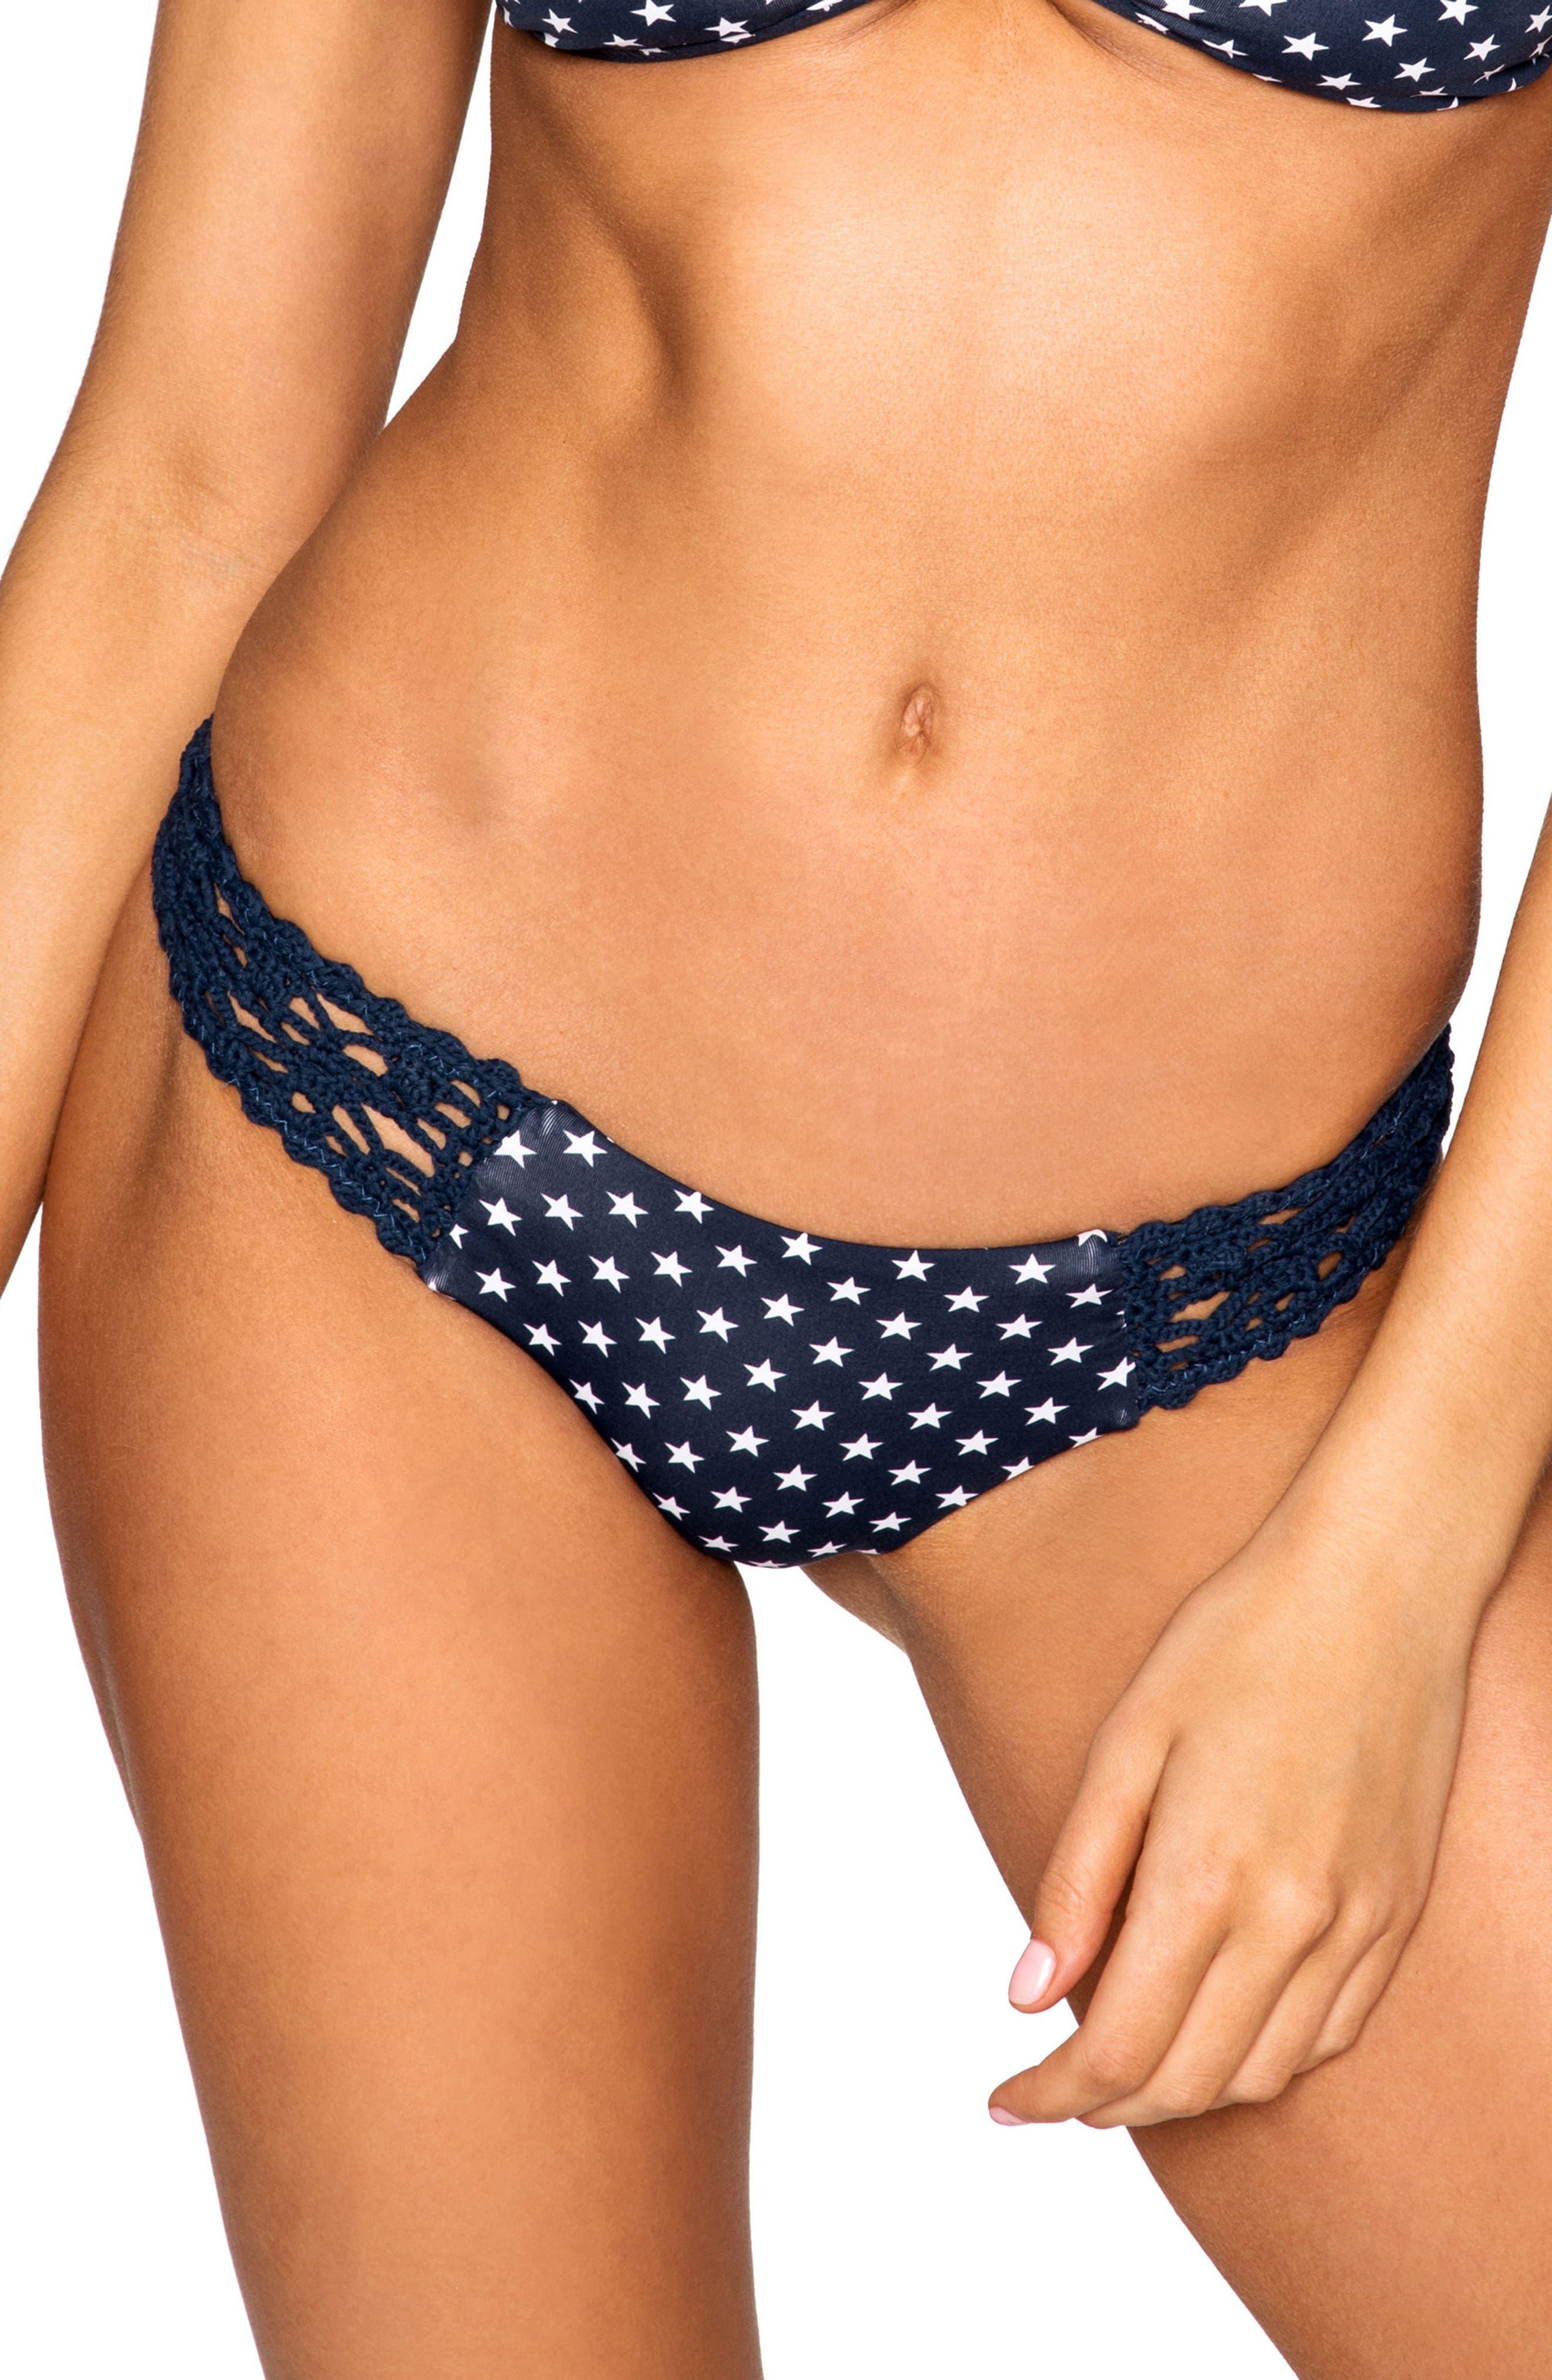 Tanner Bikini Bottoms,                         Main,                         color, 410